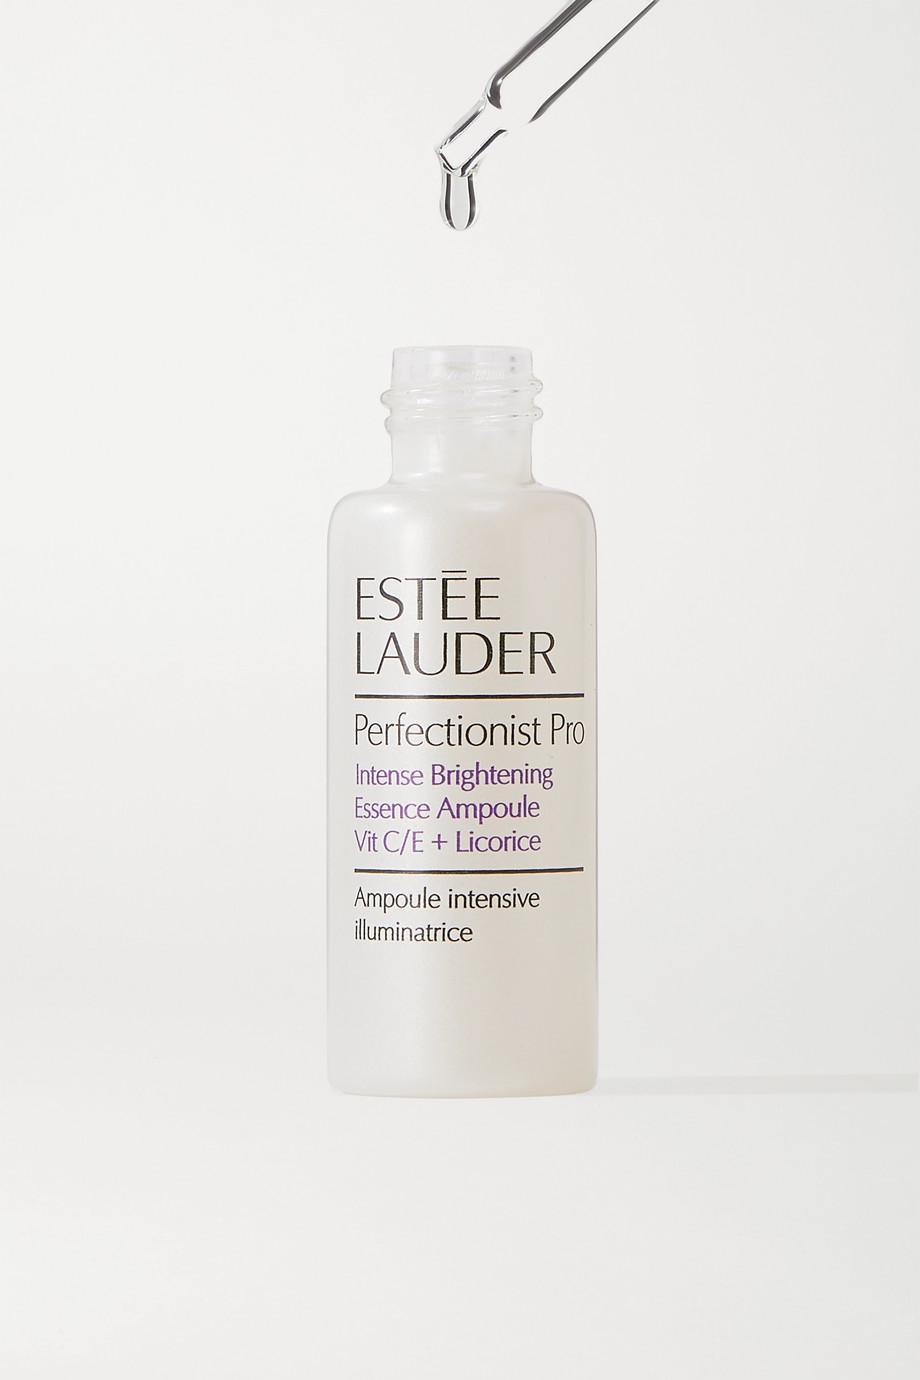 Estée Lauder Perfectionist Pro Intense Brightening Essence Ampoules, 4 x 10 ml – Serum